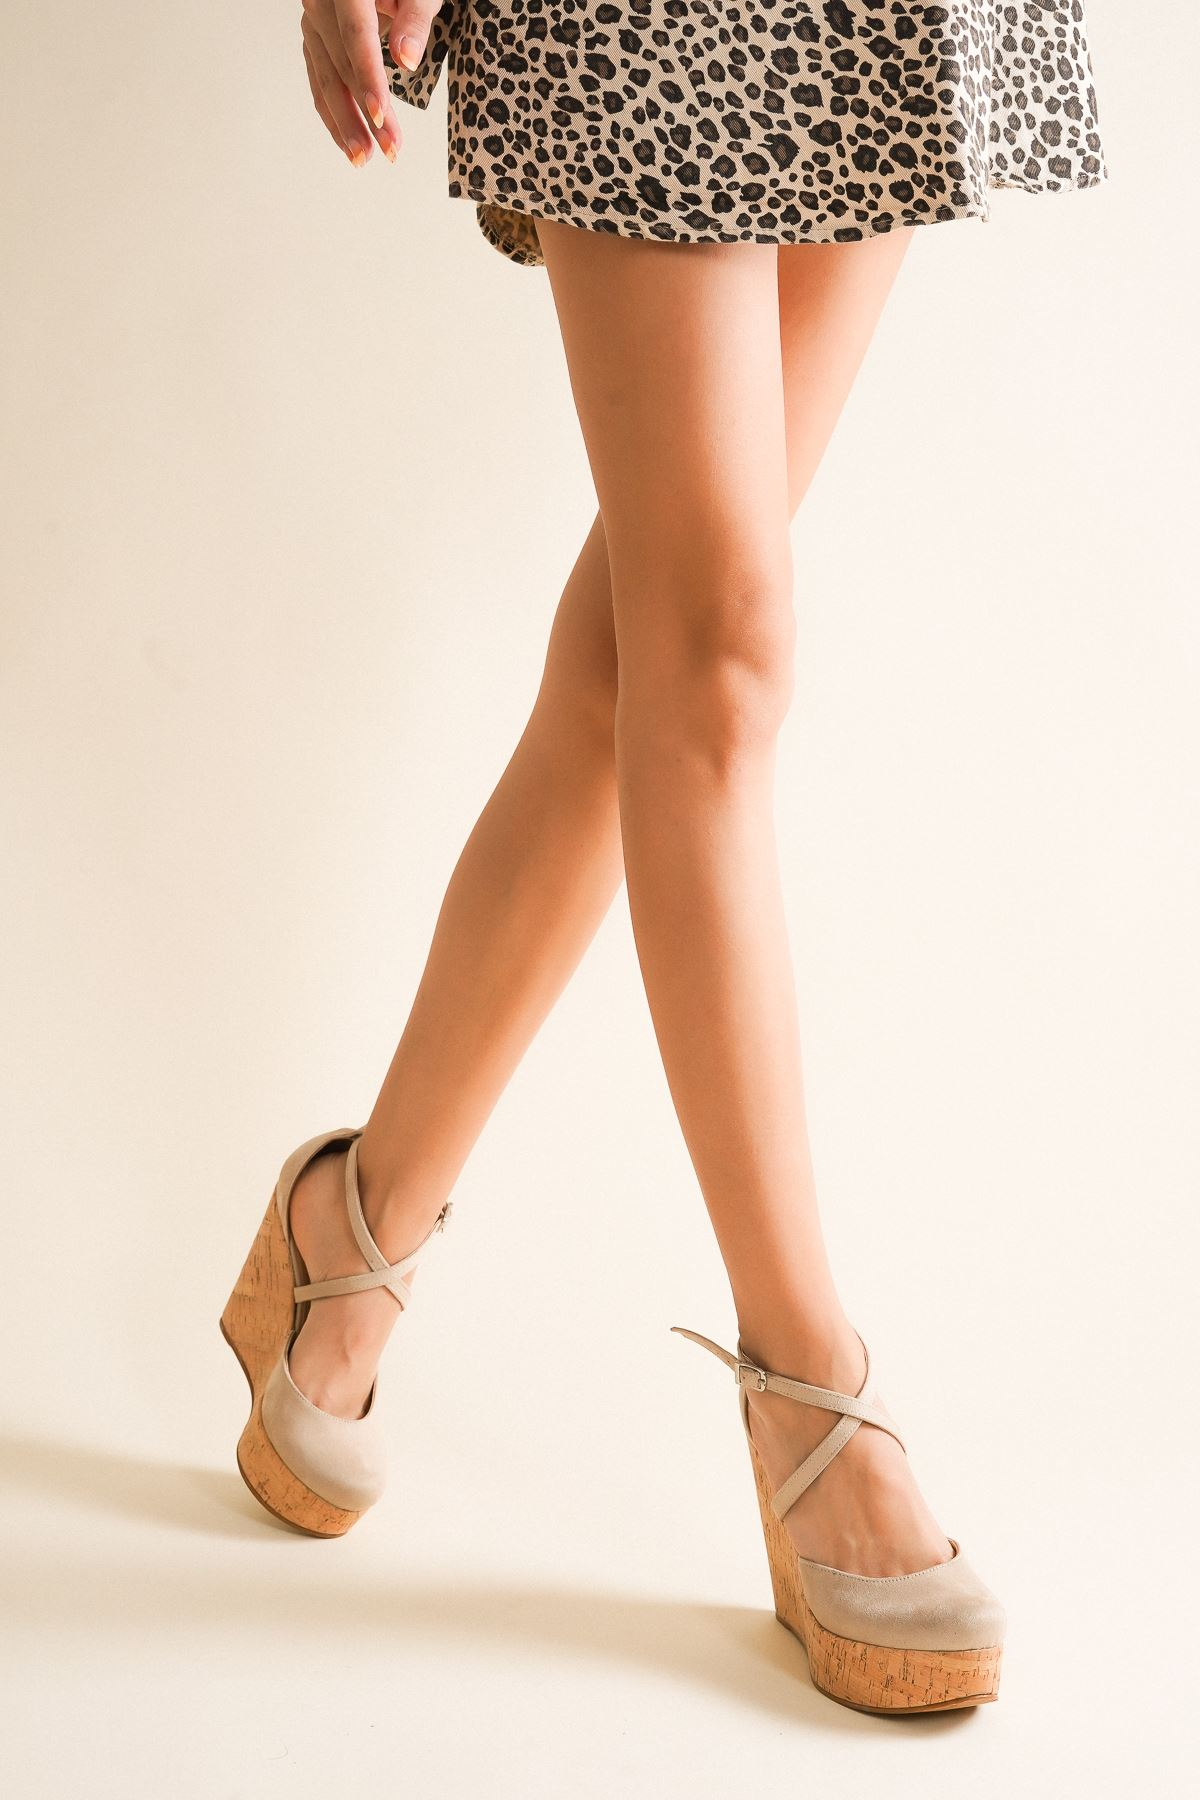 Moon Mantar Ten Süet Dolgu Topuklu Ayakkabı